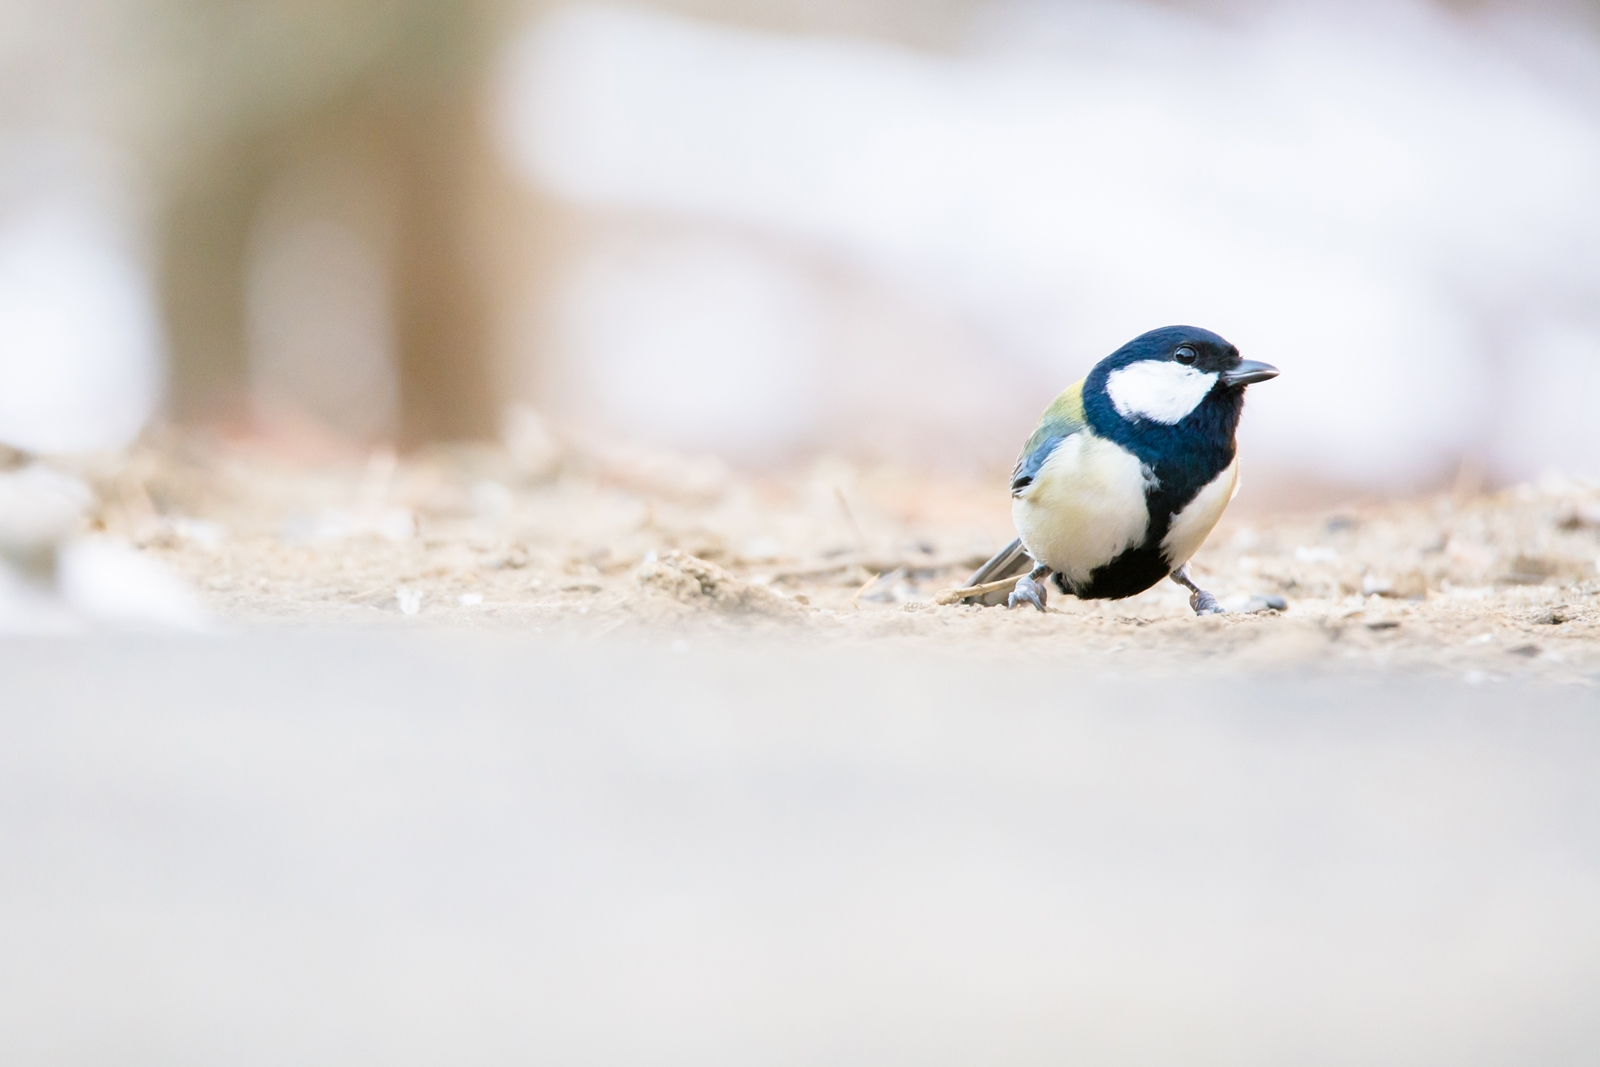 Photo: 目を凝らして Looking for something.  探し物 目を凝らして あっちかなこっちかな それはきっとすぐ近くに  Japanese Tit. (シジュウカラ) #cooljapan #365cooljapanmay  #birdphotography #birds #kawaii  #sigma #日本の写真文化を海外へ  Nikon D7100 SIGMA 150-600mm F5-6.3 DG OS HSM Sports [ Day266, February 2nd ] (2枚追加:Added 2 photo)  小鳥の詩朗読 http://youtu.be/eyaiycWC3mM?list=PL2YtHGm0-R3qVsaqvQe9OYdJFCkI98wzF